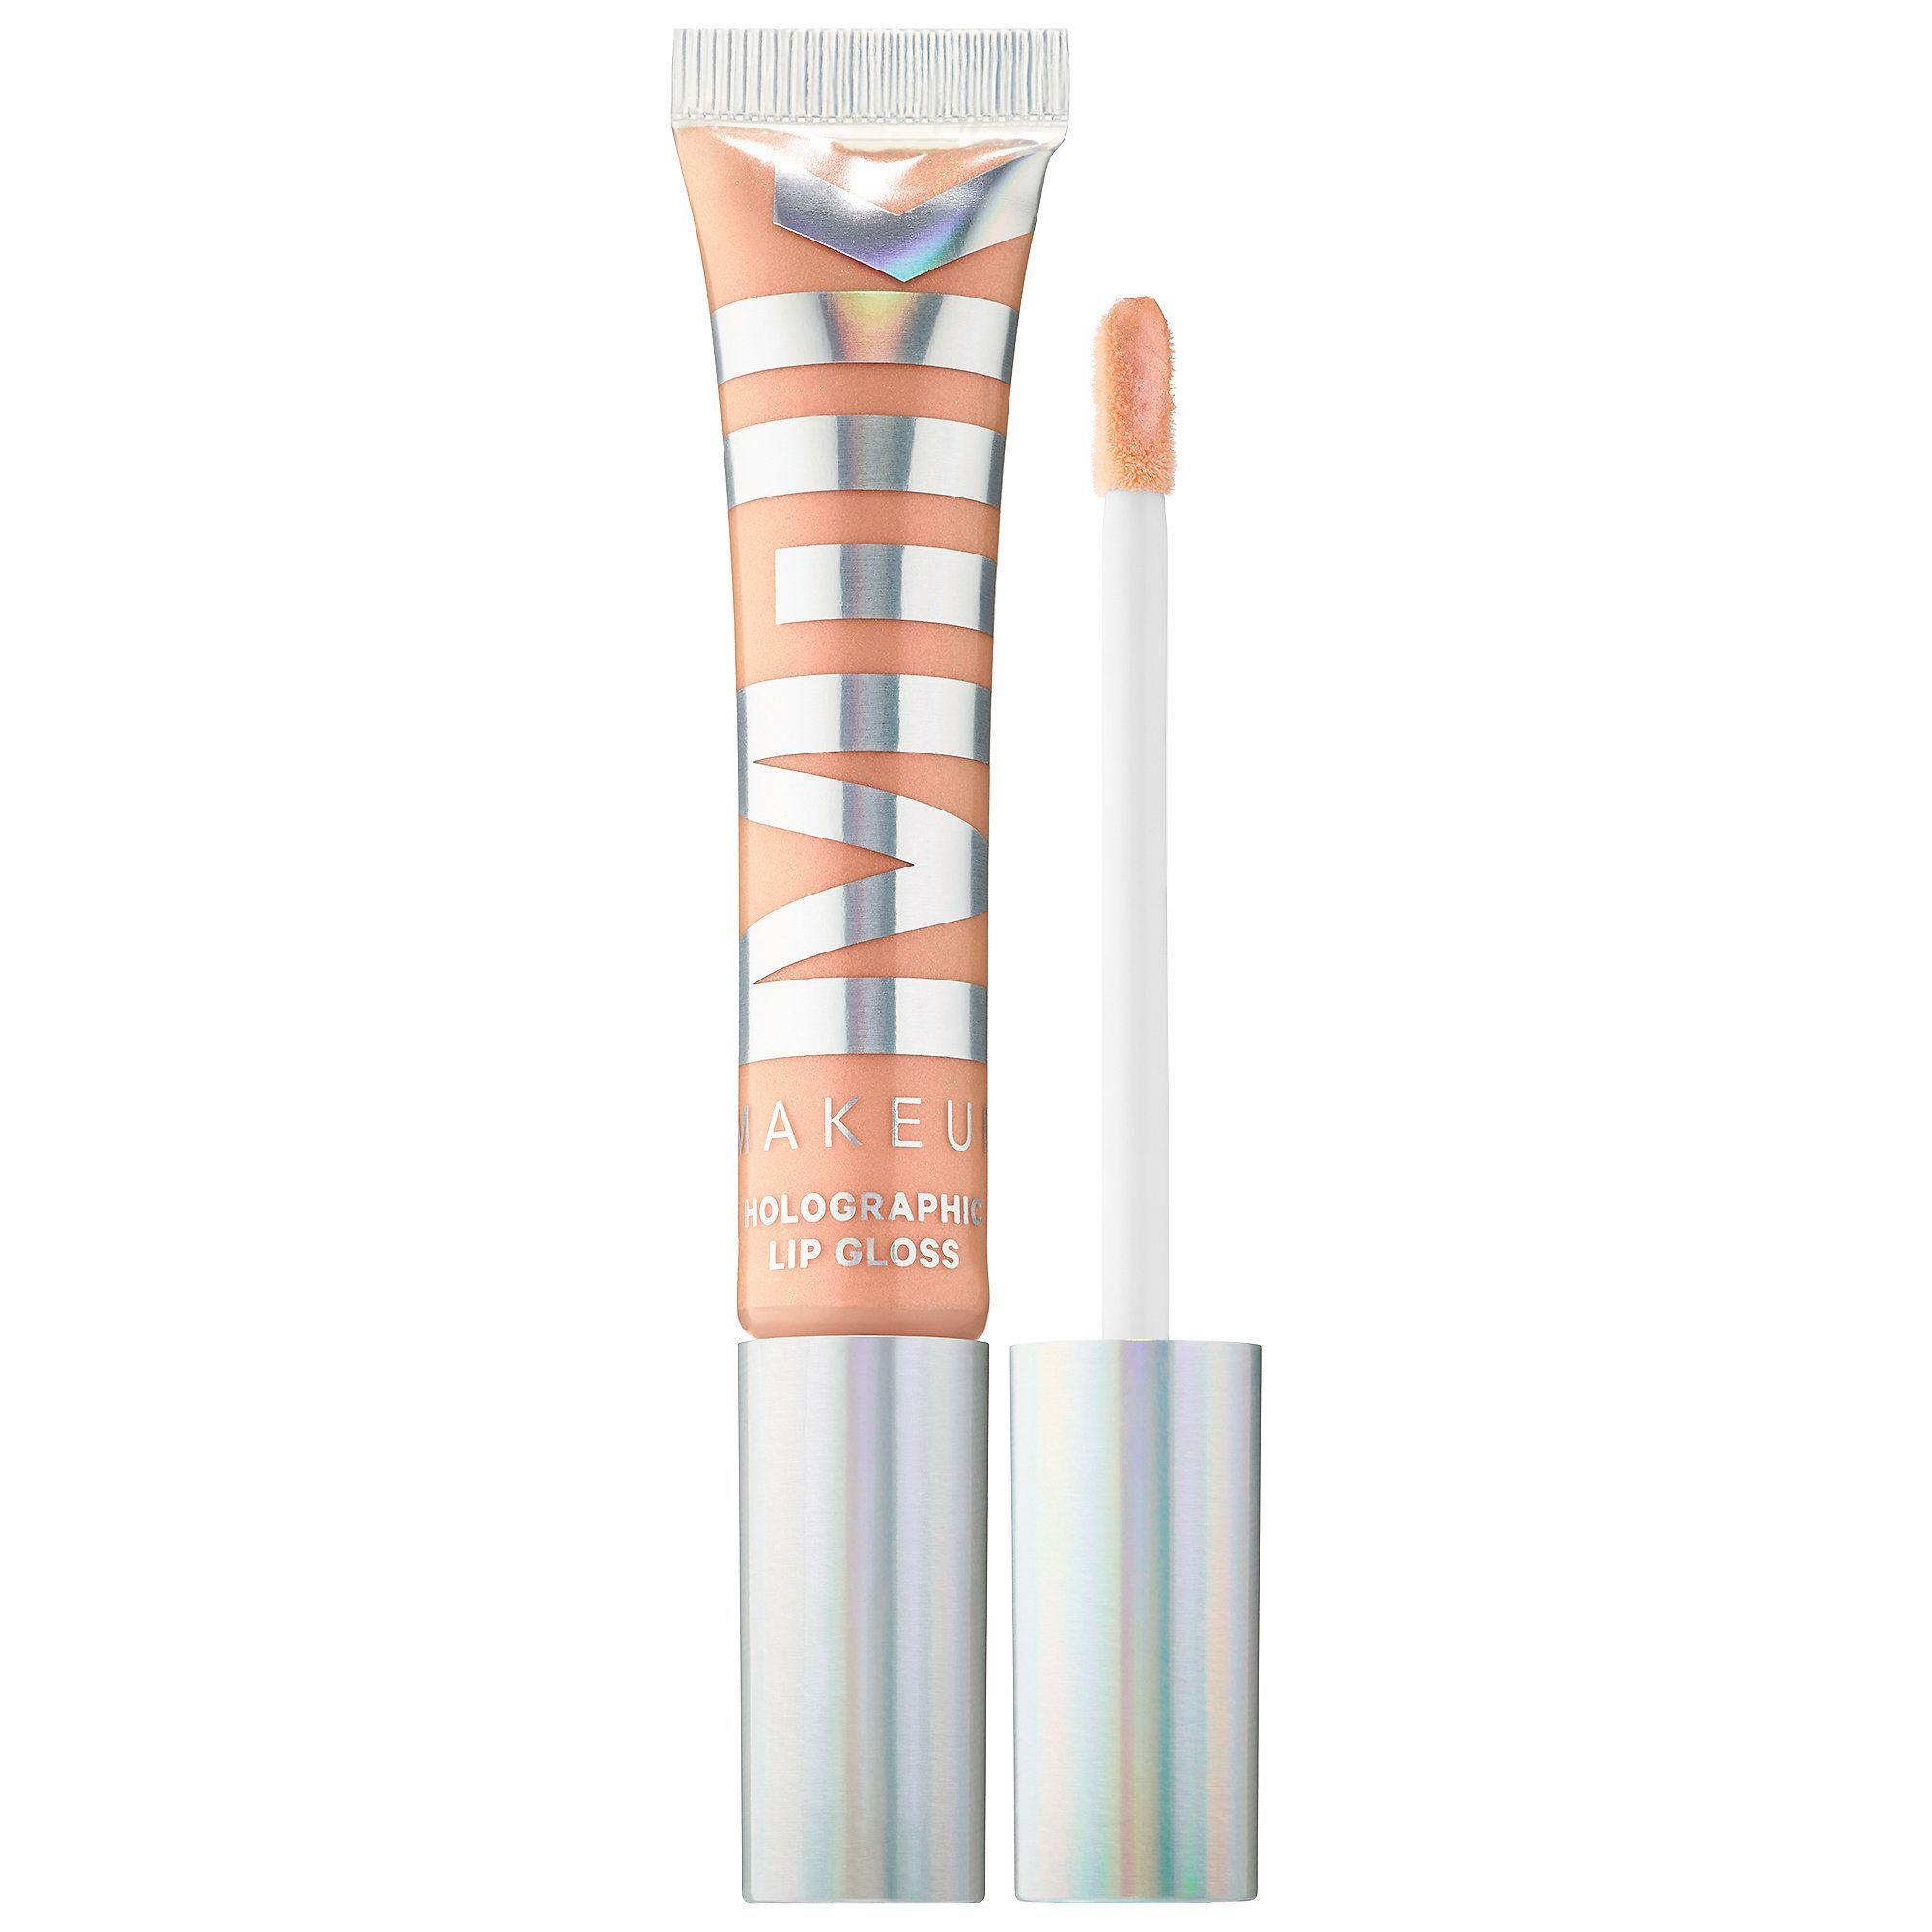 Shop Milk Makeup's Holographic Lip Gloss at Sephora. This